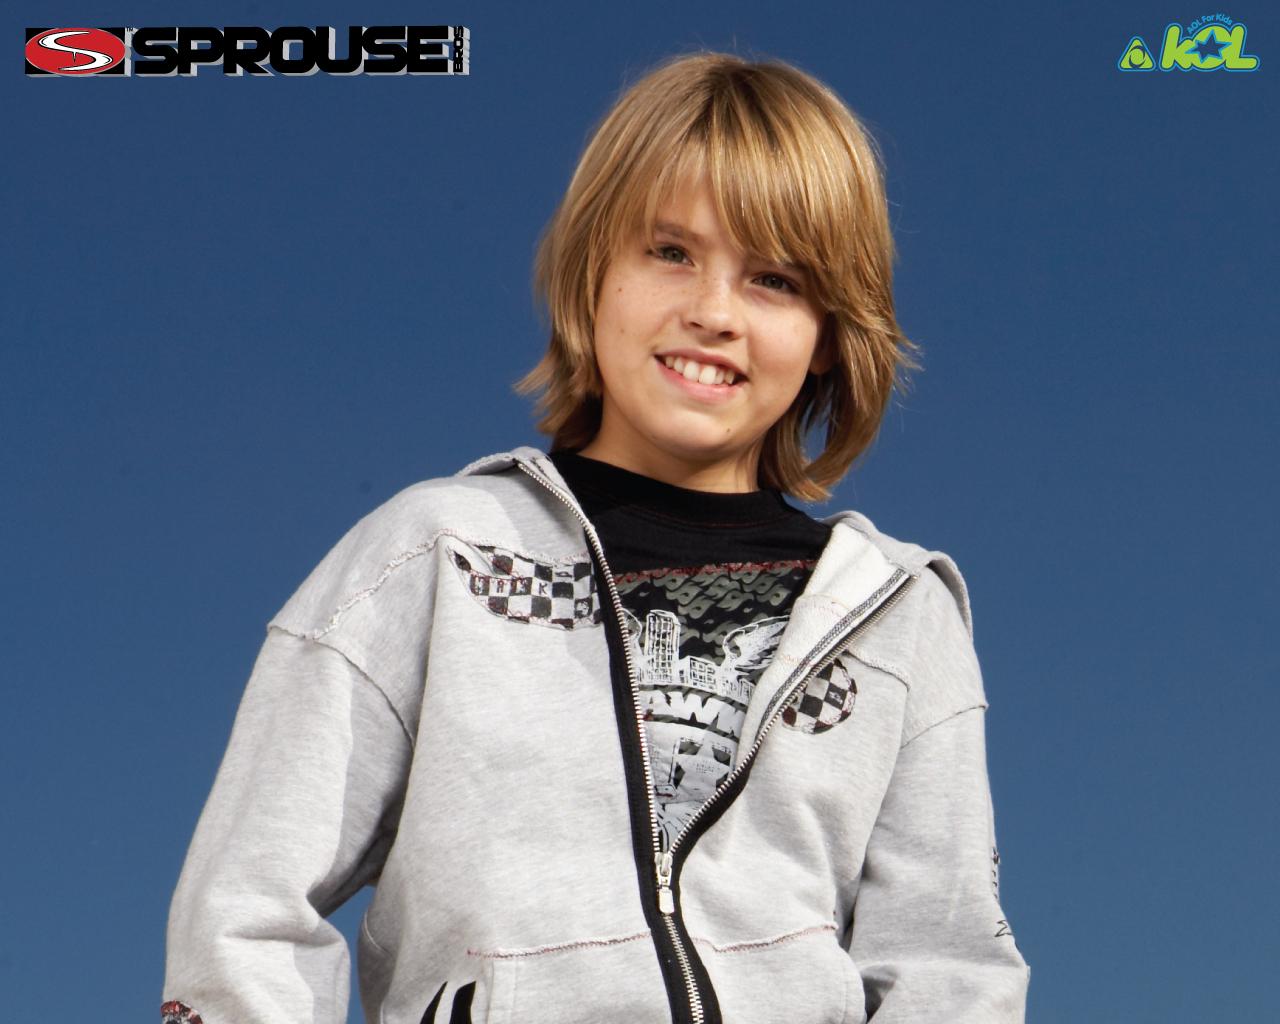 http://images4.fanpop.com/image/photos/17300000/Cole-cole-sprouse-17370109-1280-1024.jpg